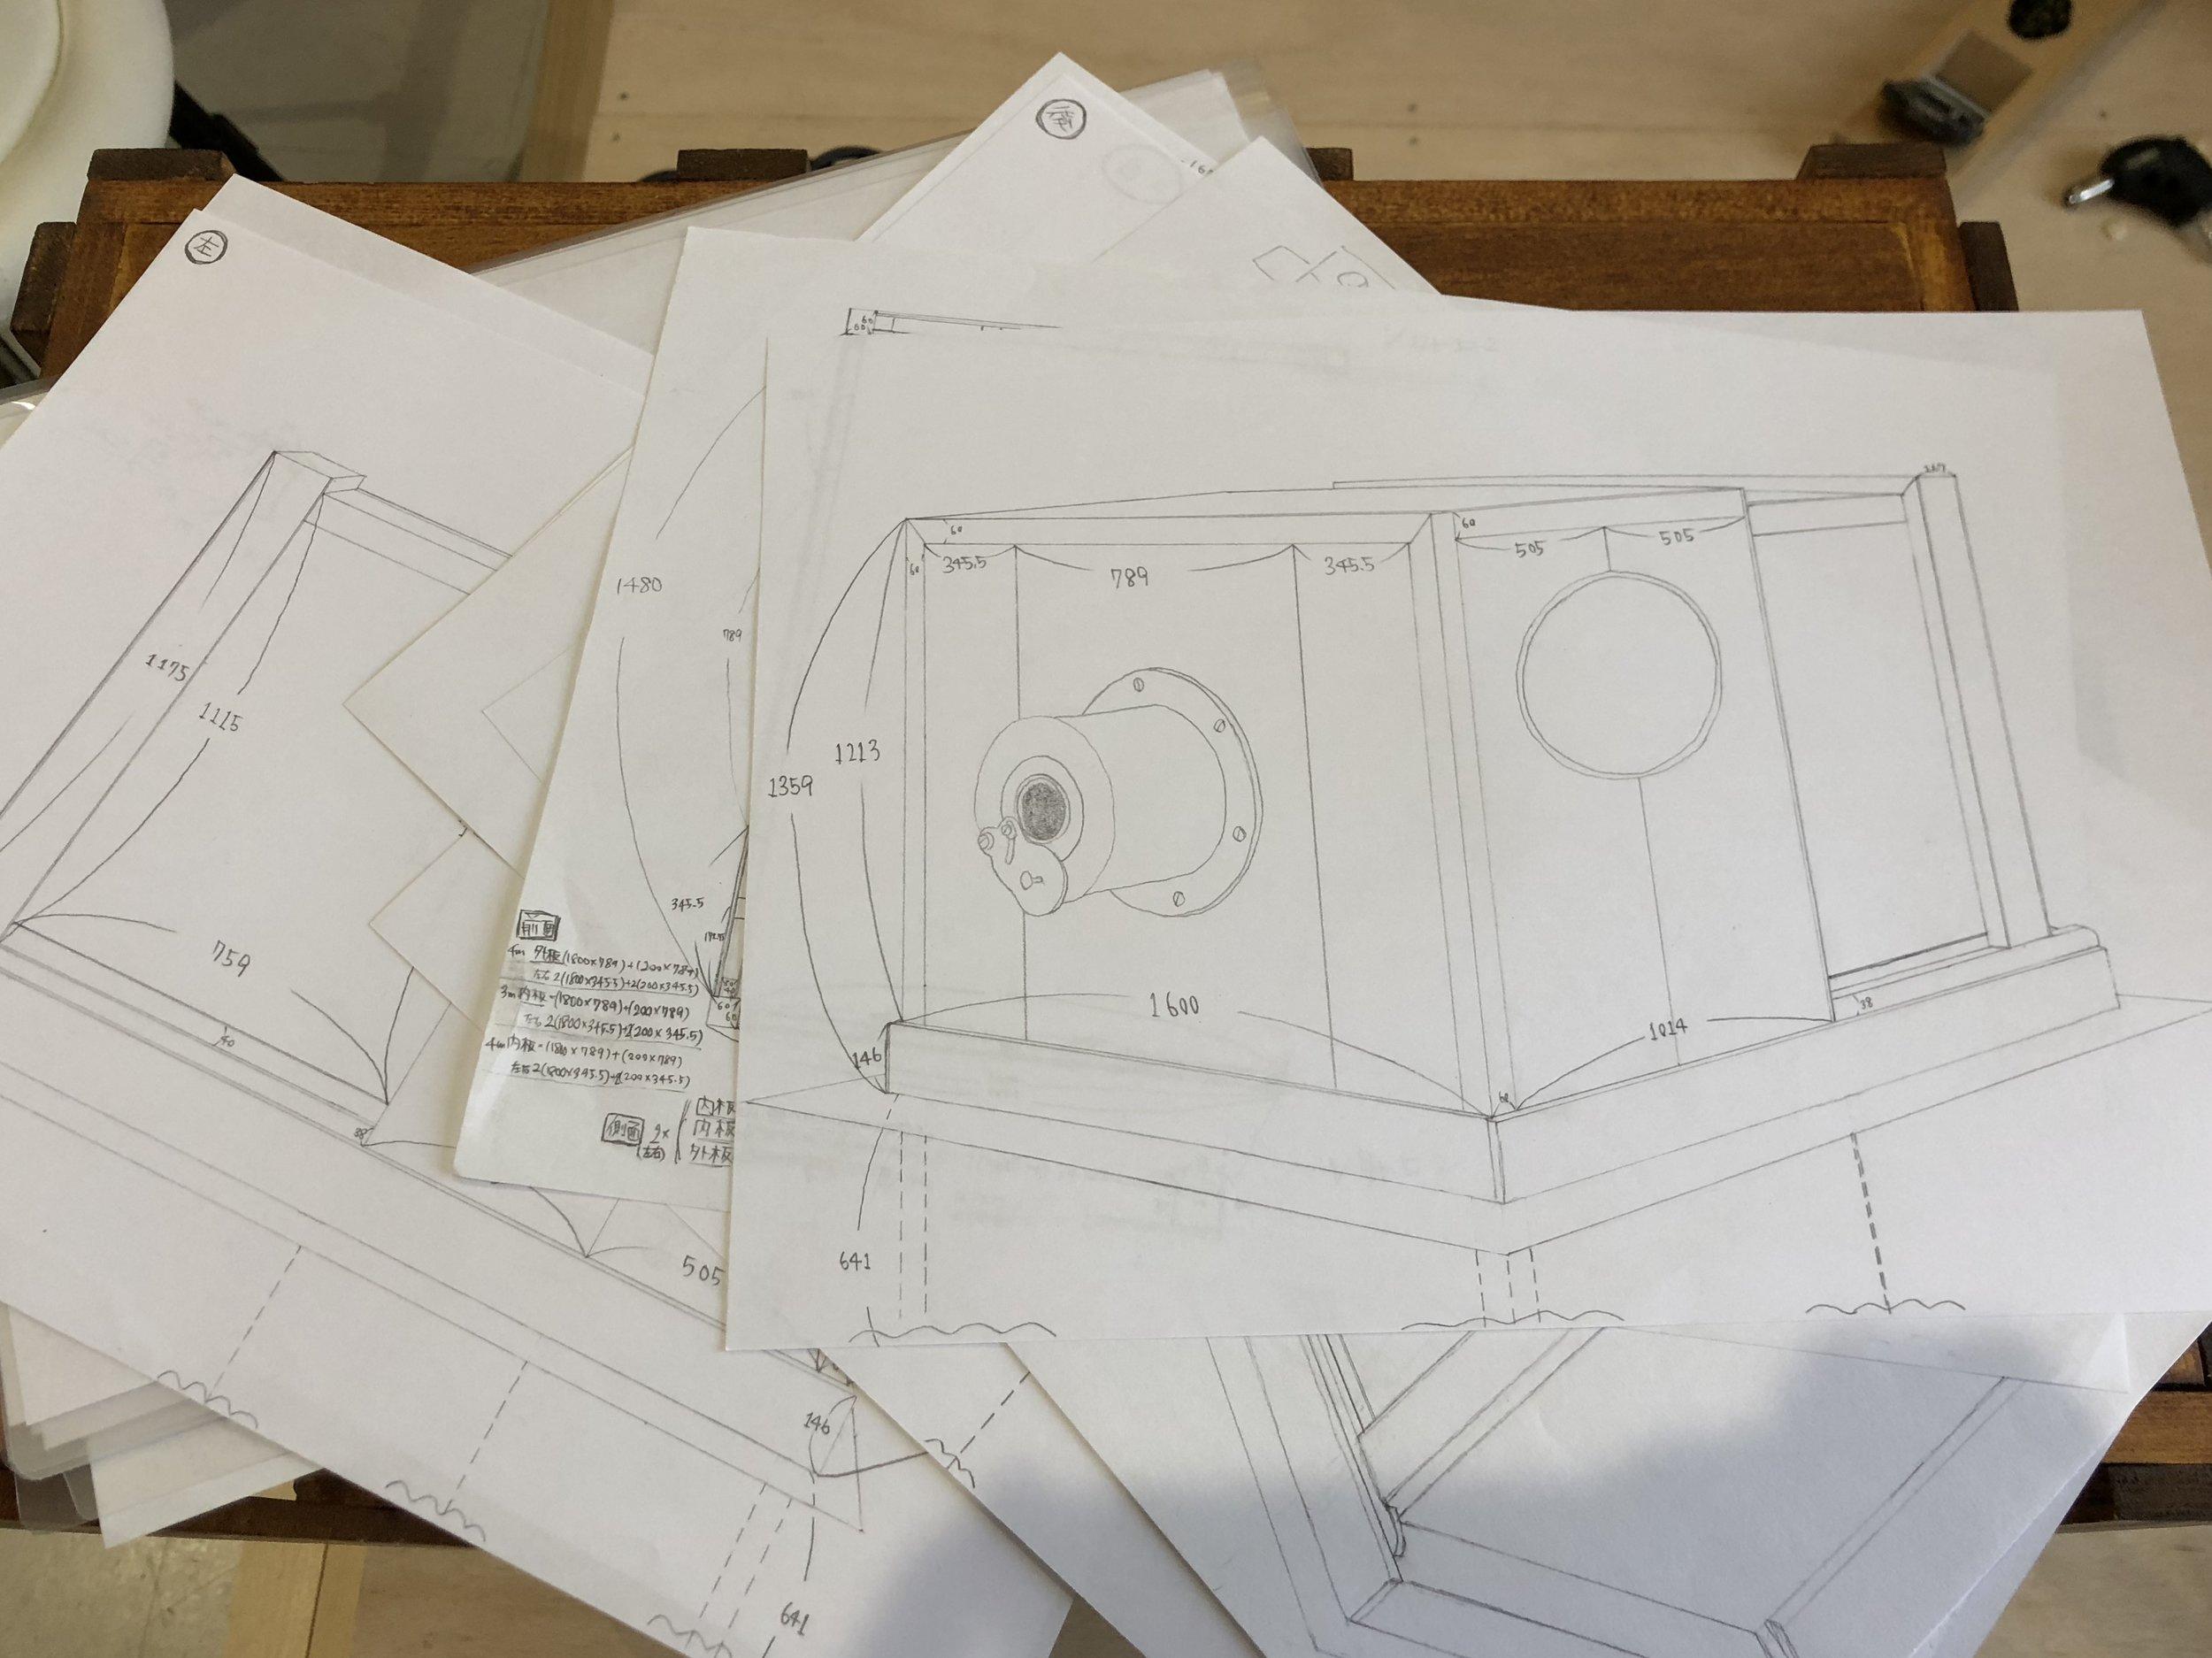 Giroux Daguerreotype Camera   世界初の商業カメラである ジルーダゲレオタイプカメラ の形を模した 巨大カメラ兼暗室 を現在製作中。古典写真技法を撮影後、お客様とこの巨大カメラに入り共に 現像作業 を行います。この巨大カメラは実際に 撮影することも可能 であり、... つづきをみる